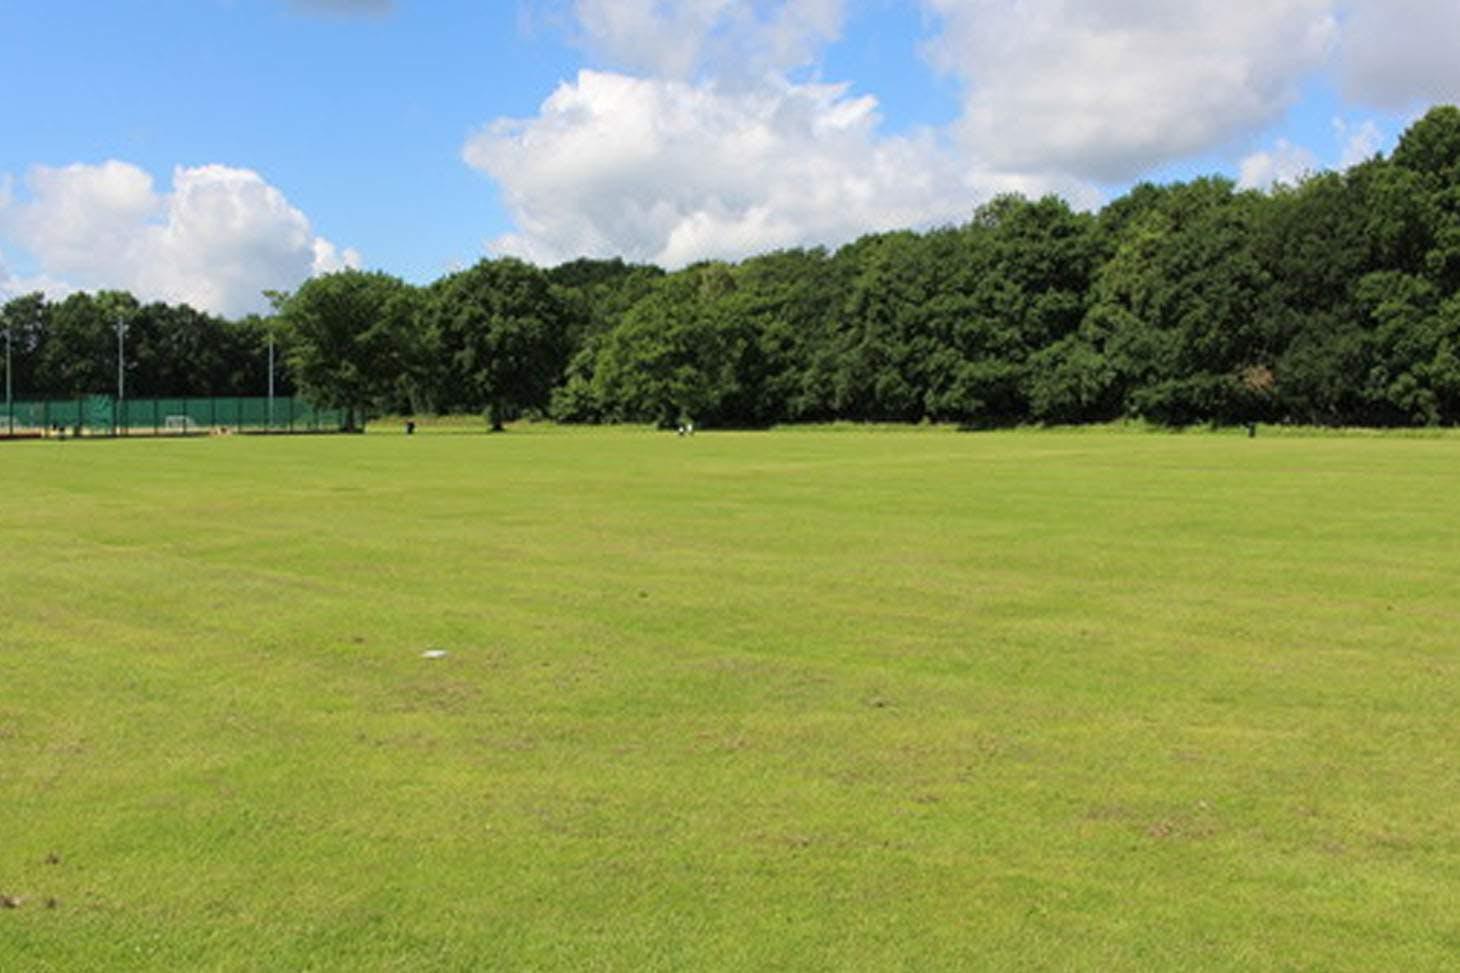 Light Hall School 11 a side | Grass football pitch